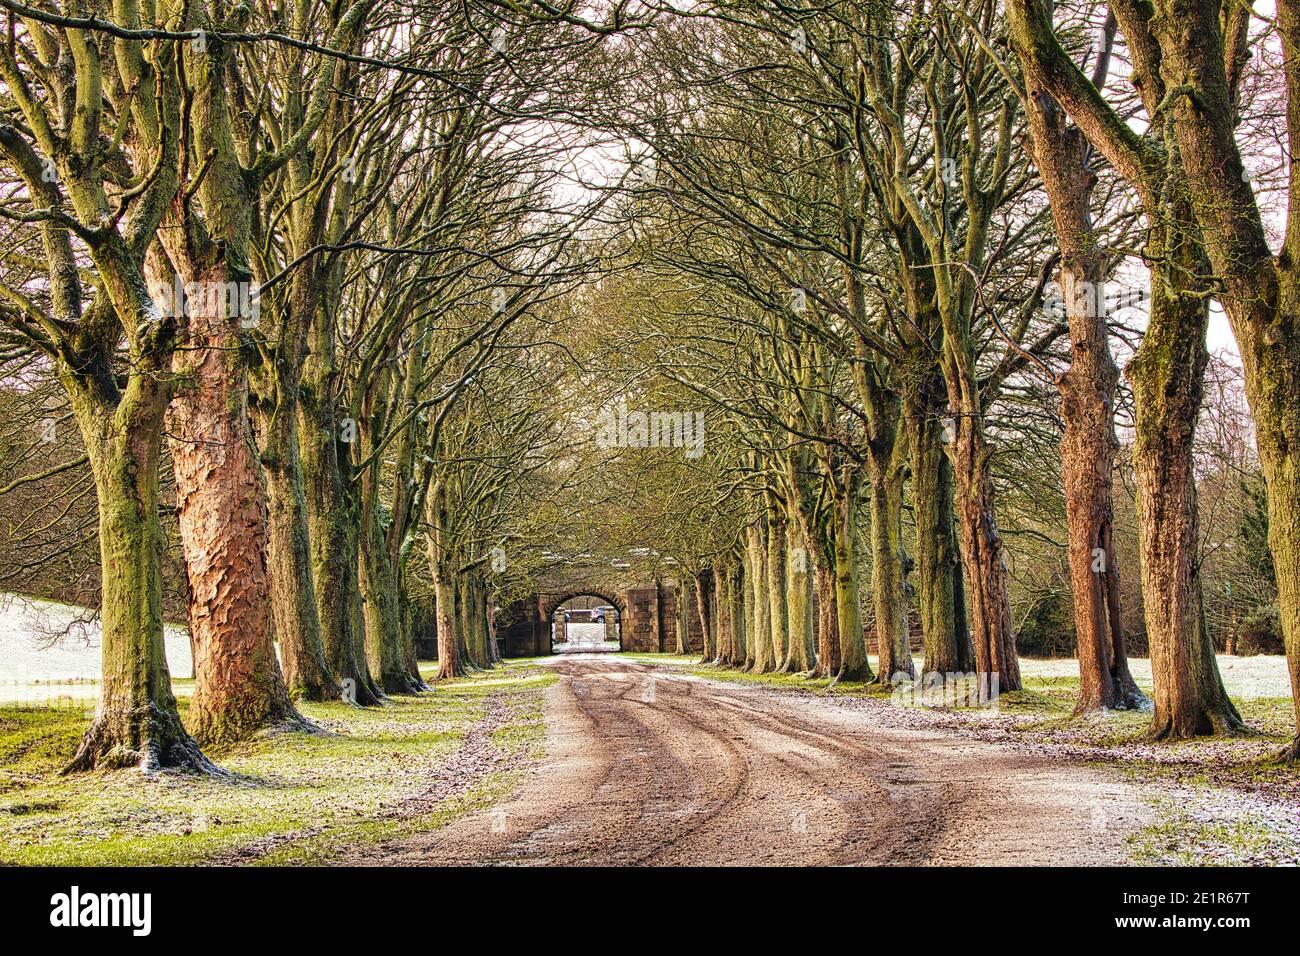 Avenue of Trees at Winter near Durham, County Durham, England, UK. Stock Photo